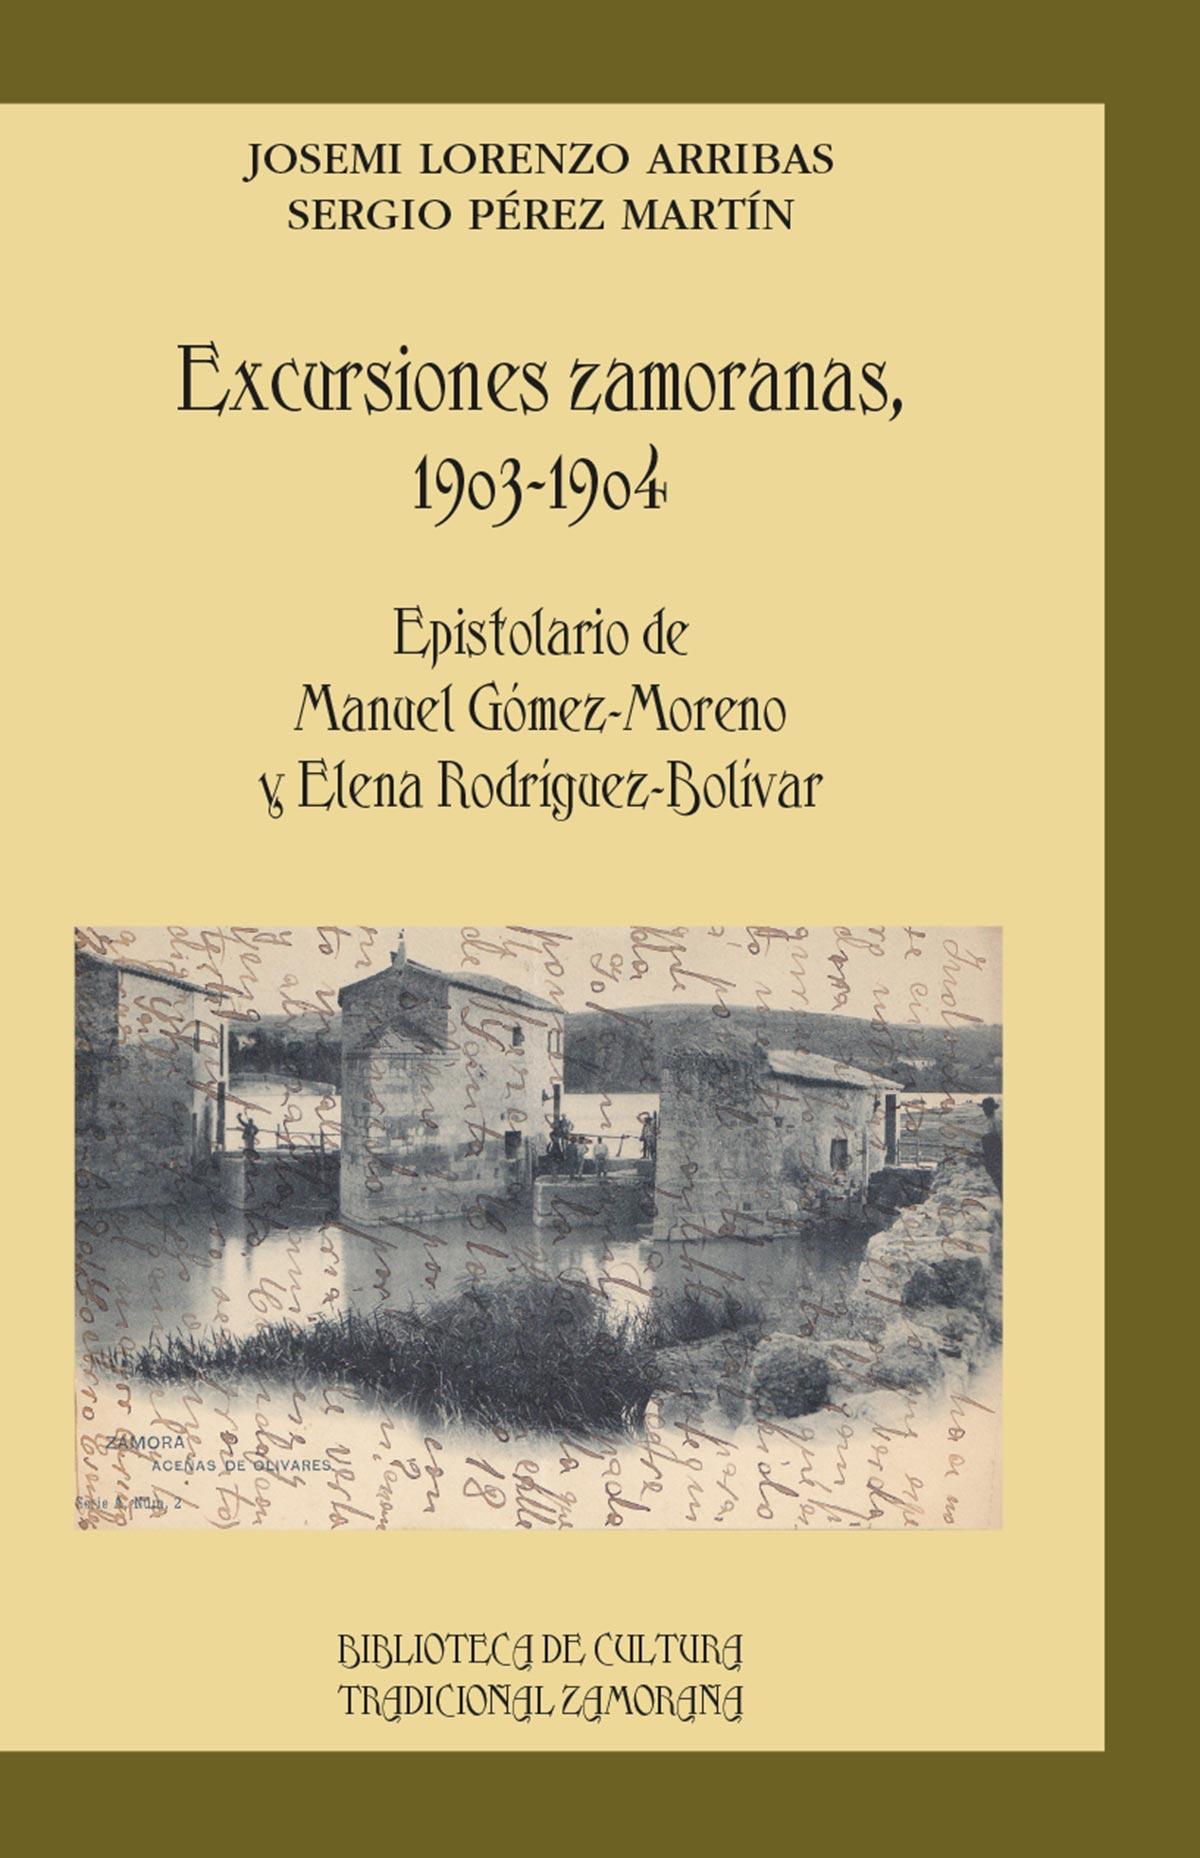 Excursiones Zamoranas 1903-1904 Josemi Lorenzo Arribas & Sergio Pérez Martín